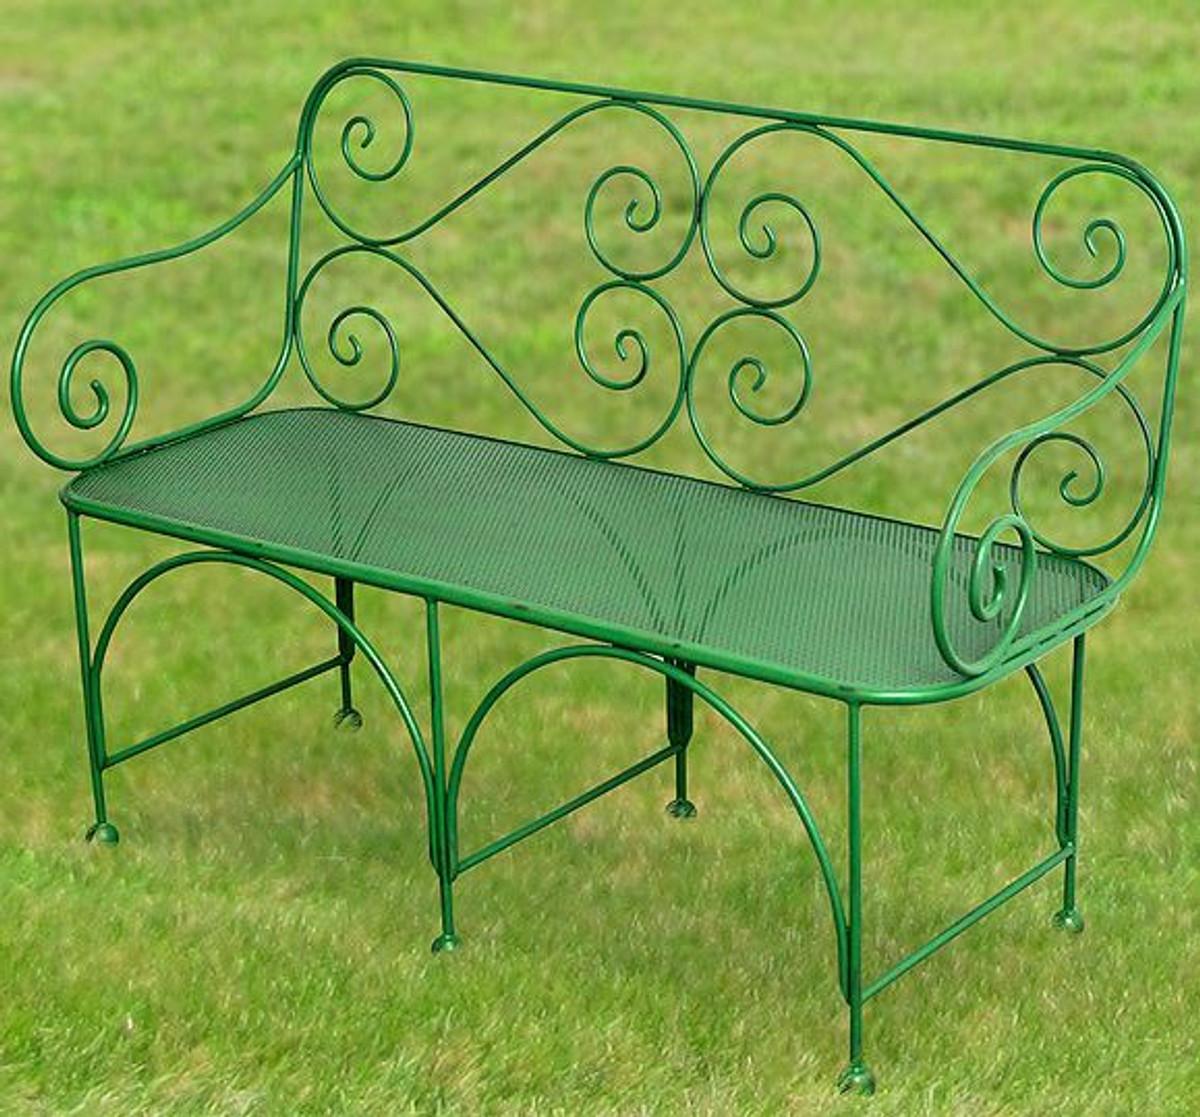 Casa Padrino Garden Bench With Perforated Seating Area Art Deco Garden Furniture Casa Padrino De